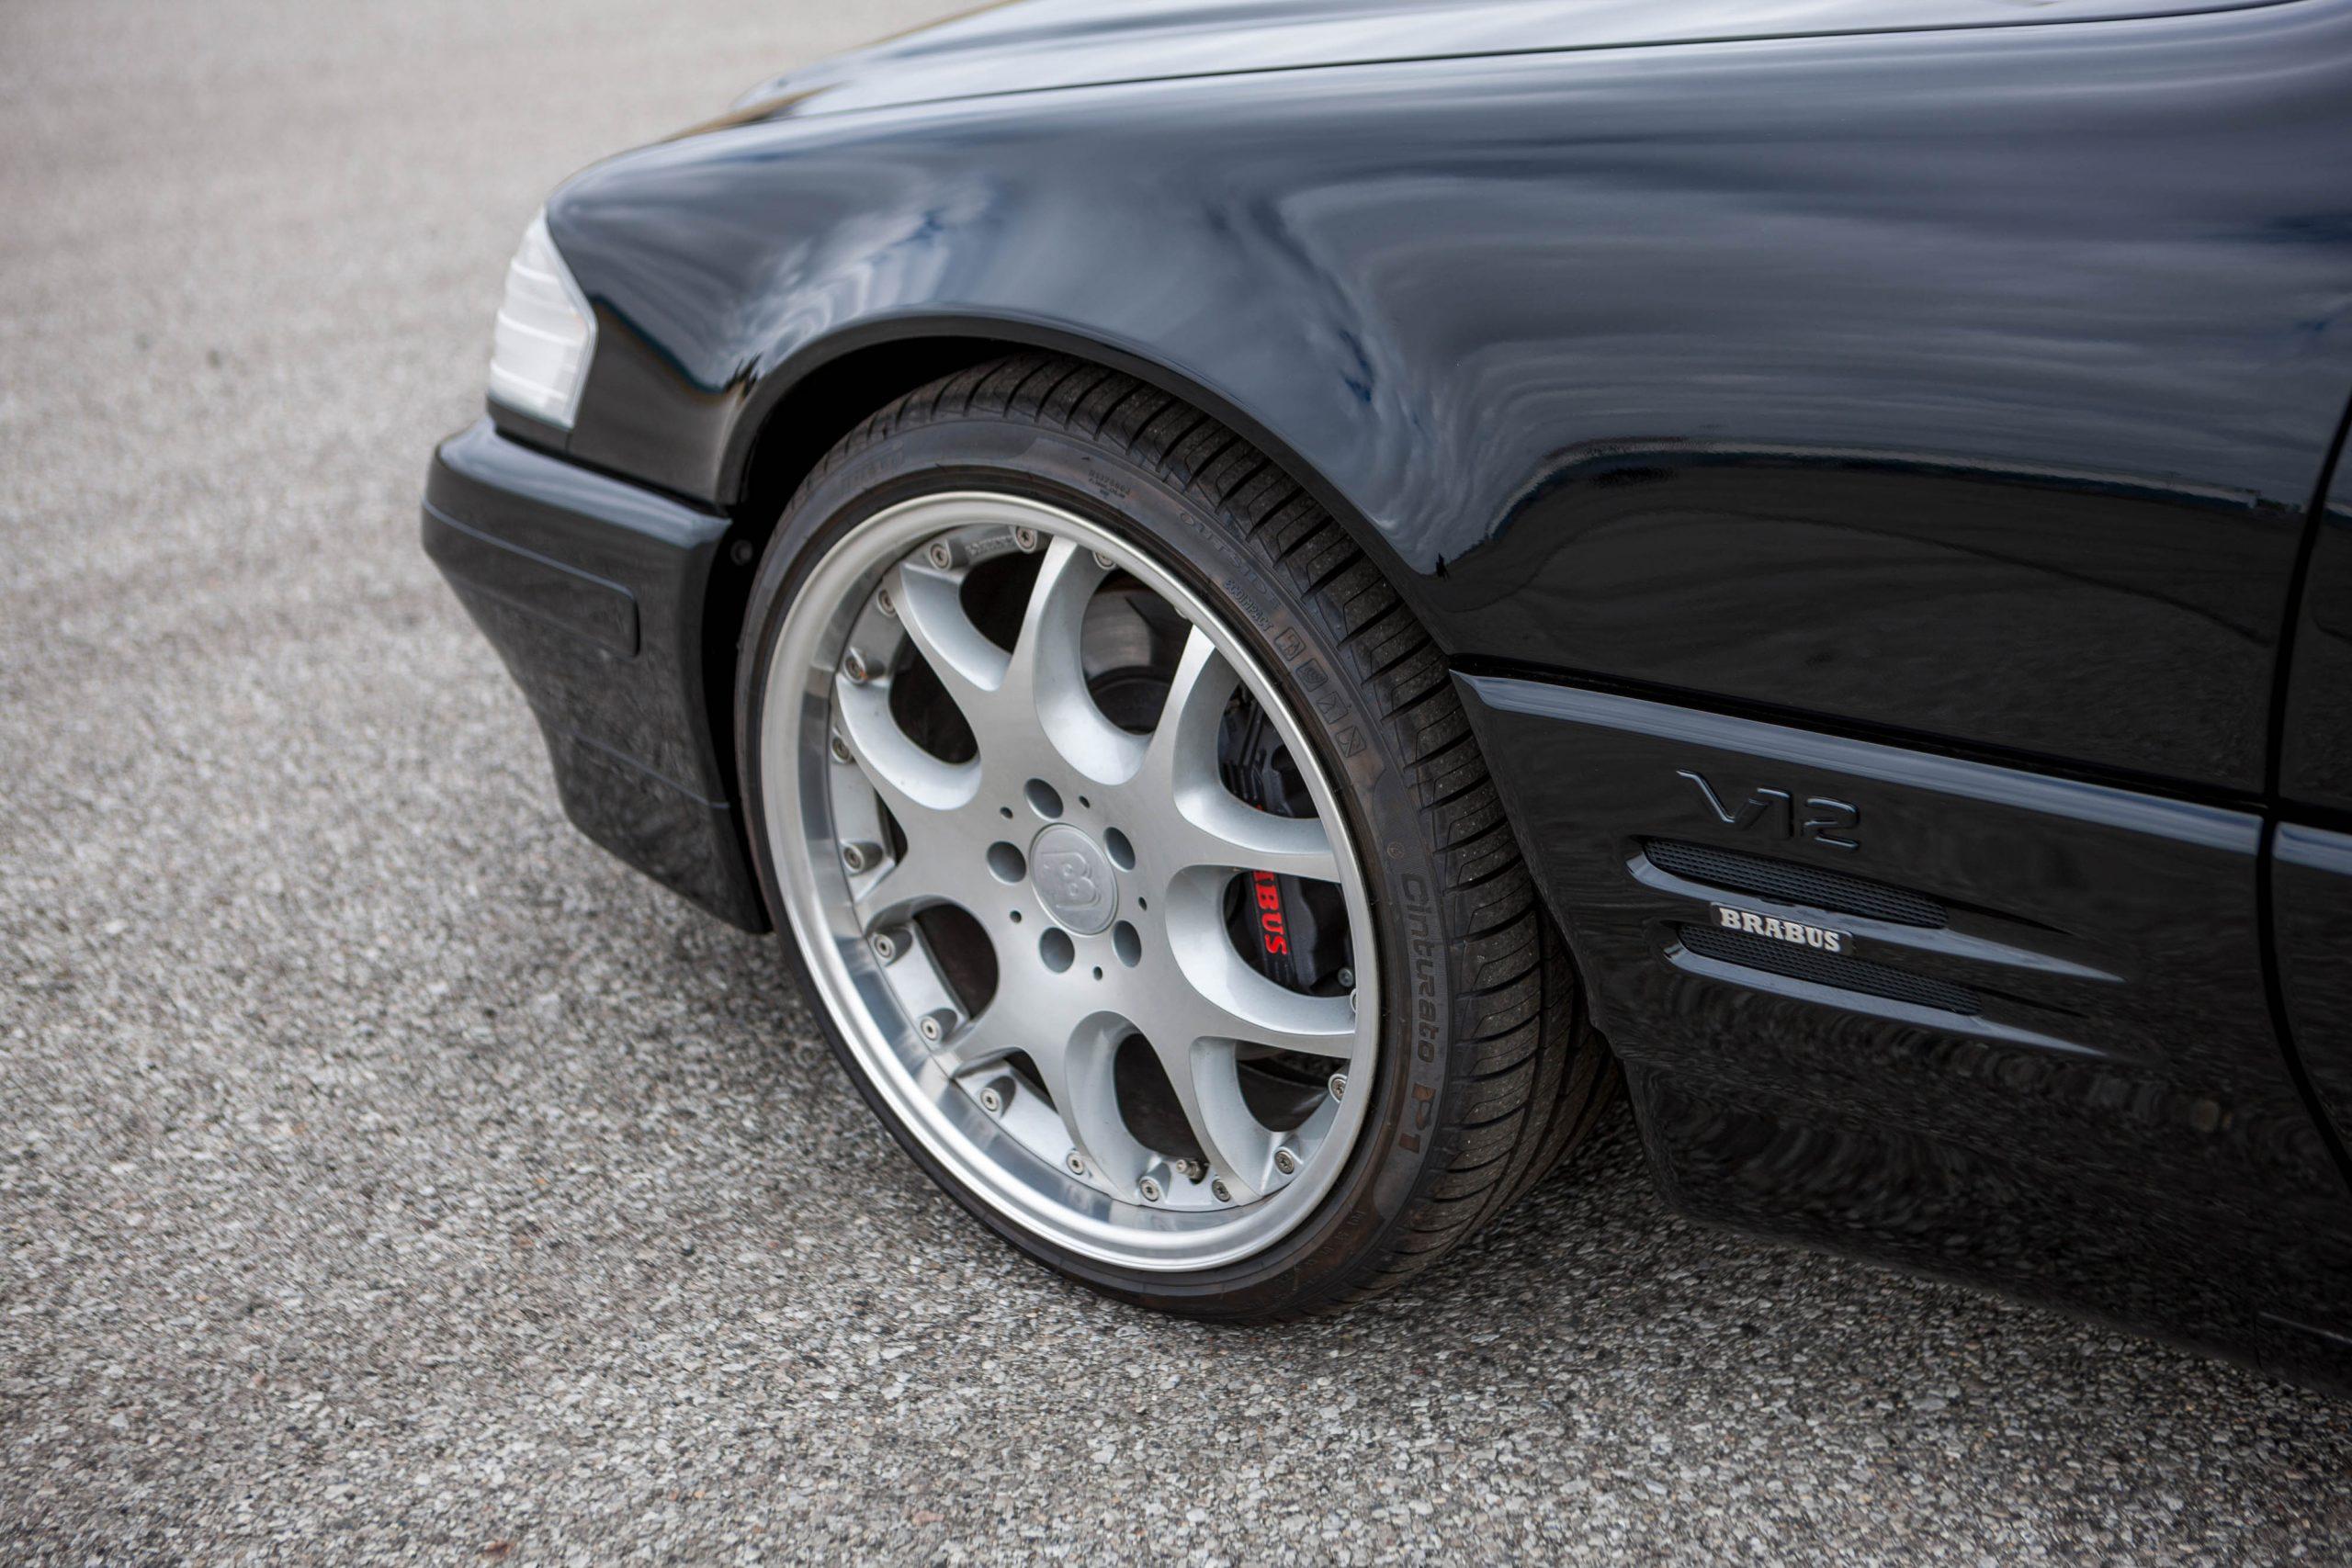 1999 Mercedes-Benz Brabus 7.3 S front wheel